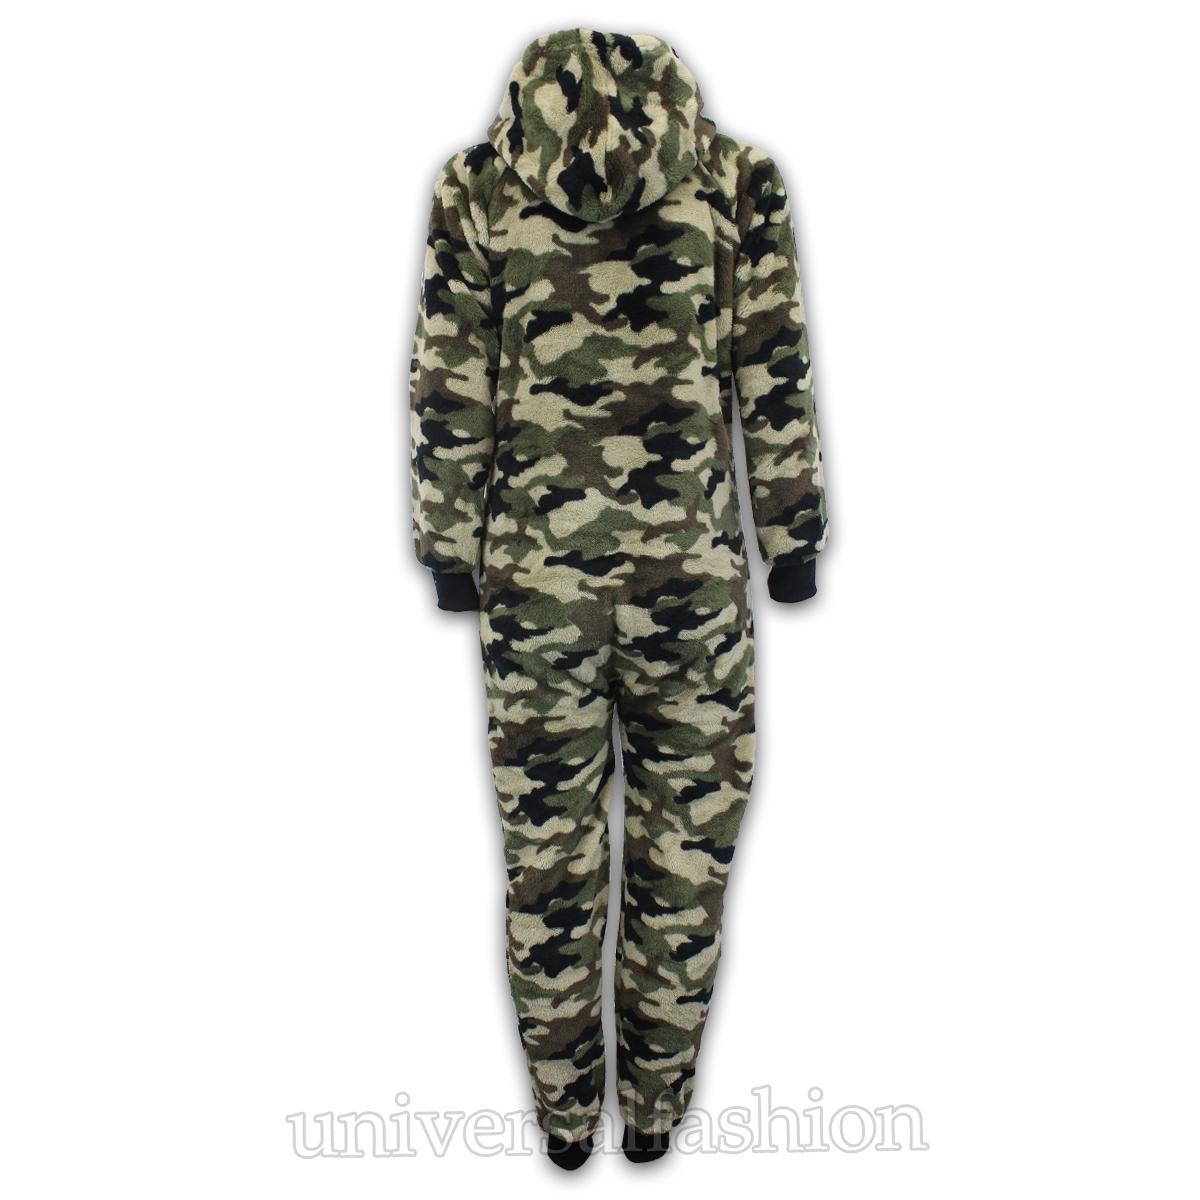 Kids Jumpsuits Boys Bodysuit Girls Aztec Print All In One Playsuit Hooded Fleece